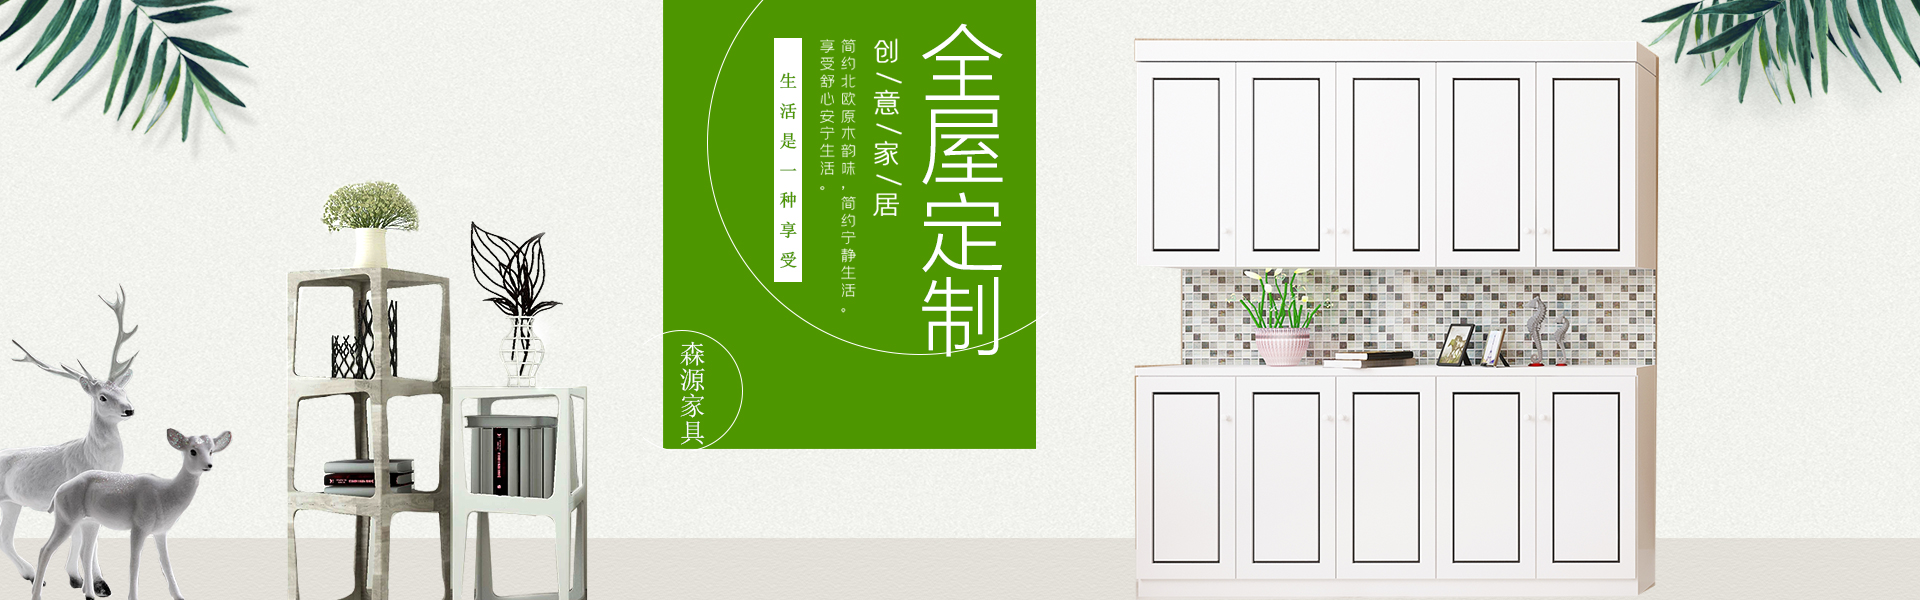 http://www.zhongguosenyuan.com/data/images/slide/20190926103814_924.jpg